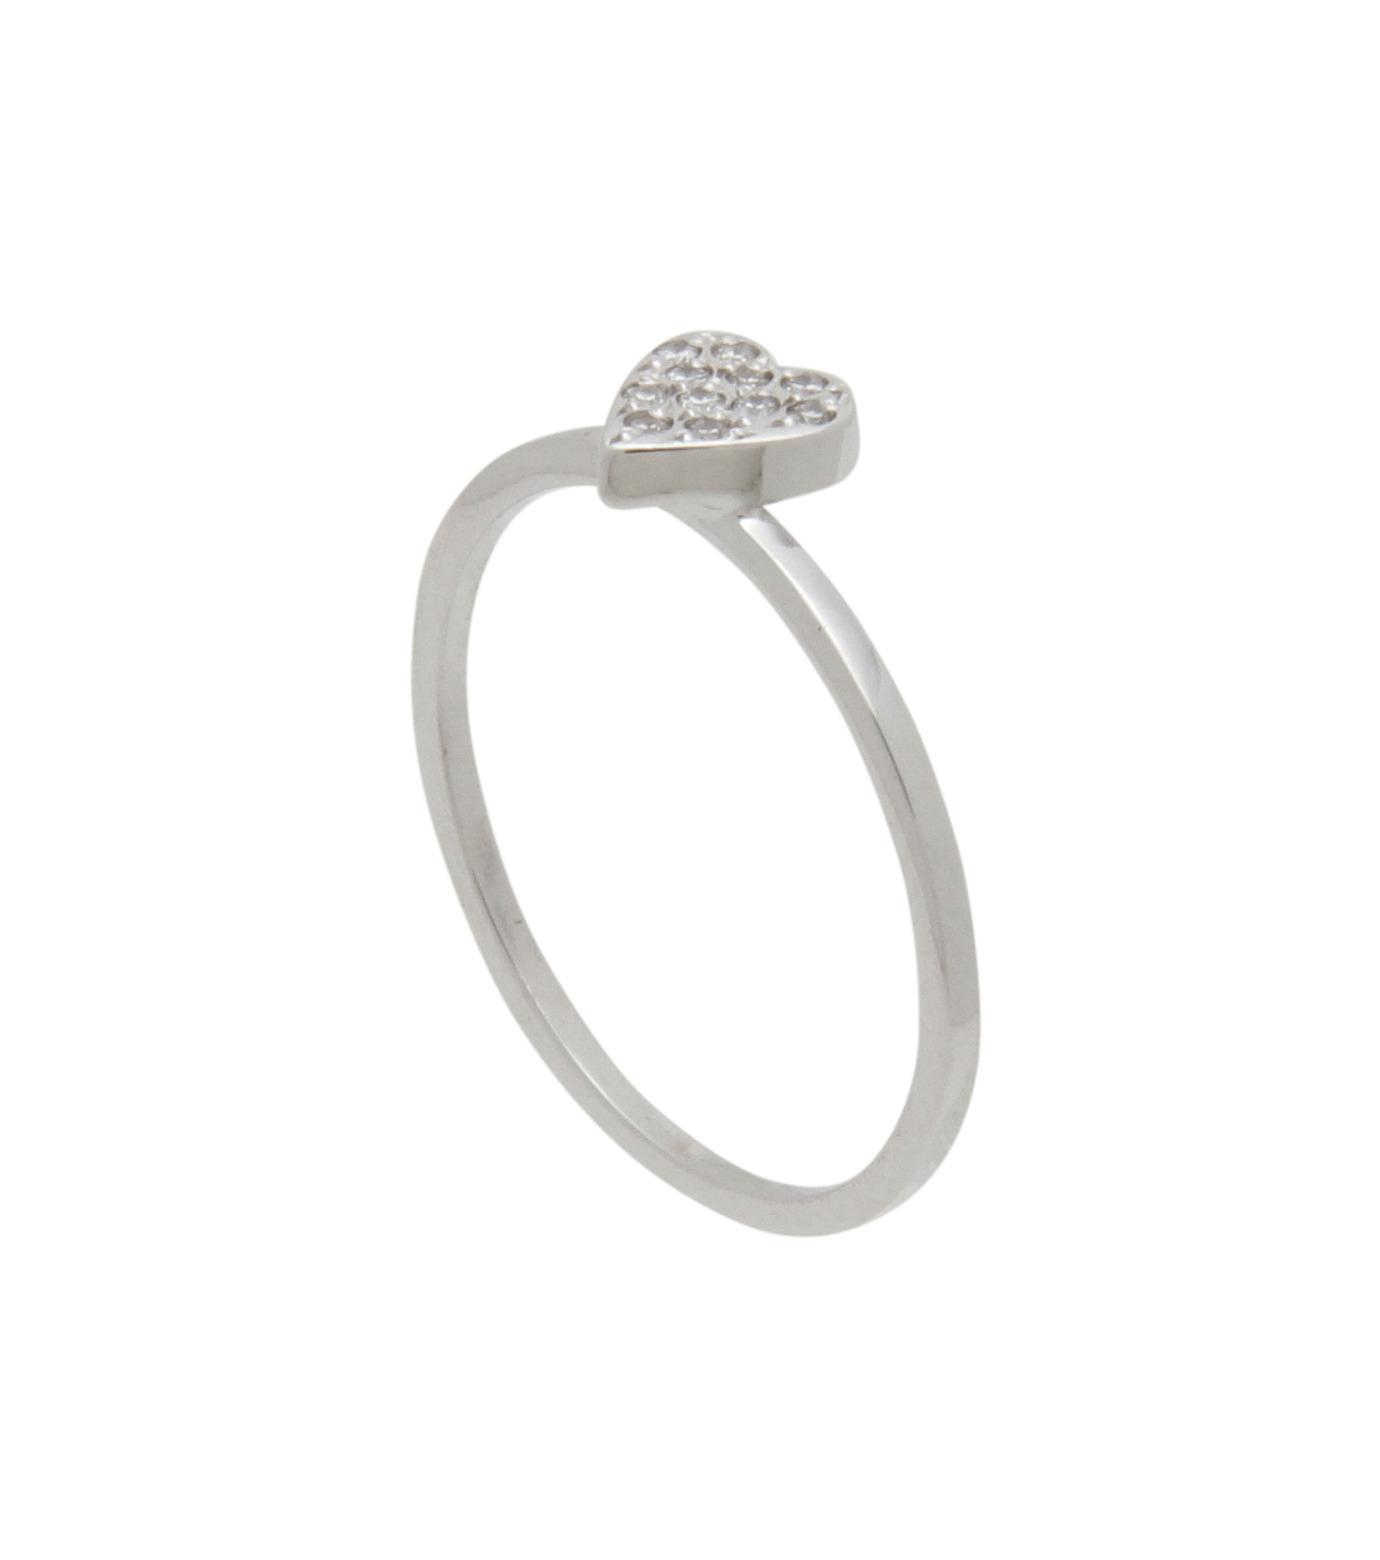 Ileana Makri(イリーナ マクリ)のLove Ring White Gold-Diamond-SILVER(リング/ring)-O272-01-001-1 拡大詳細画像2